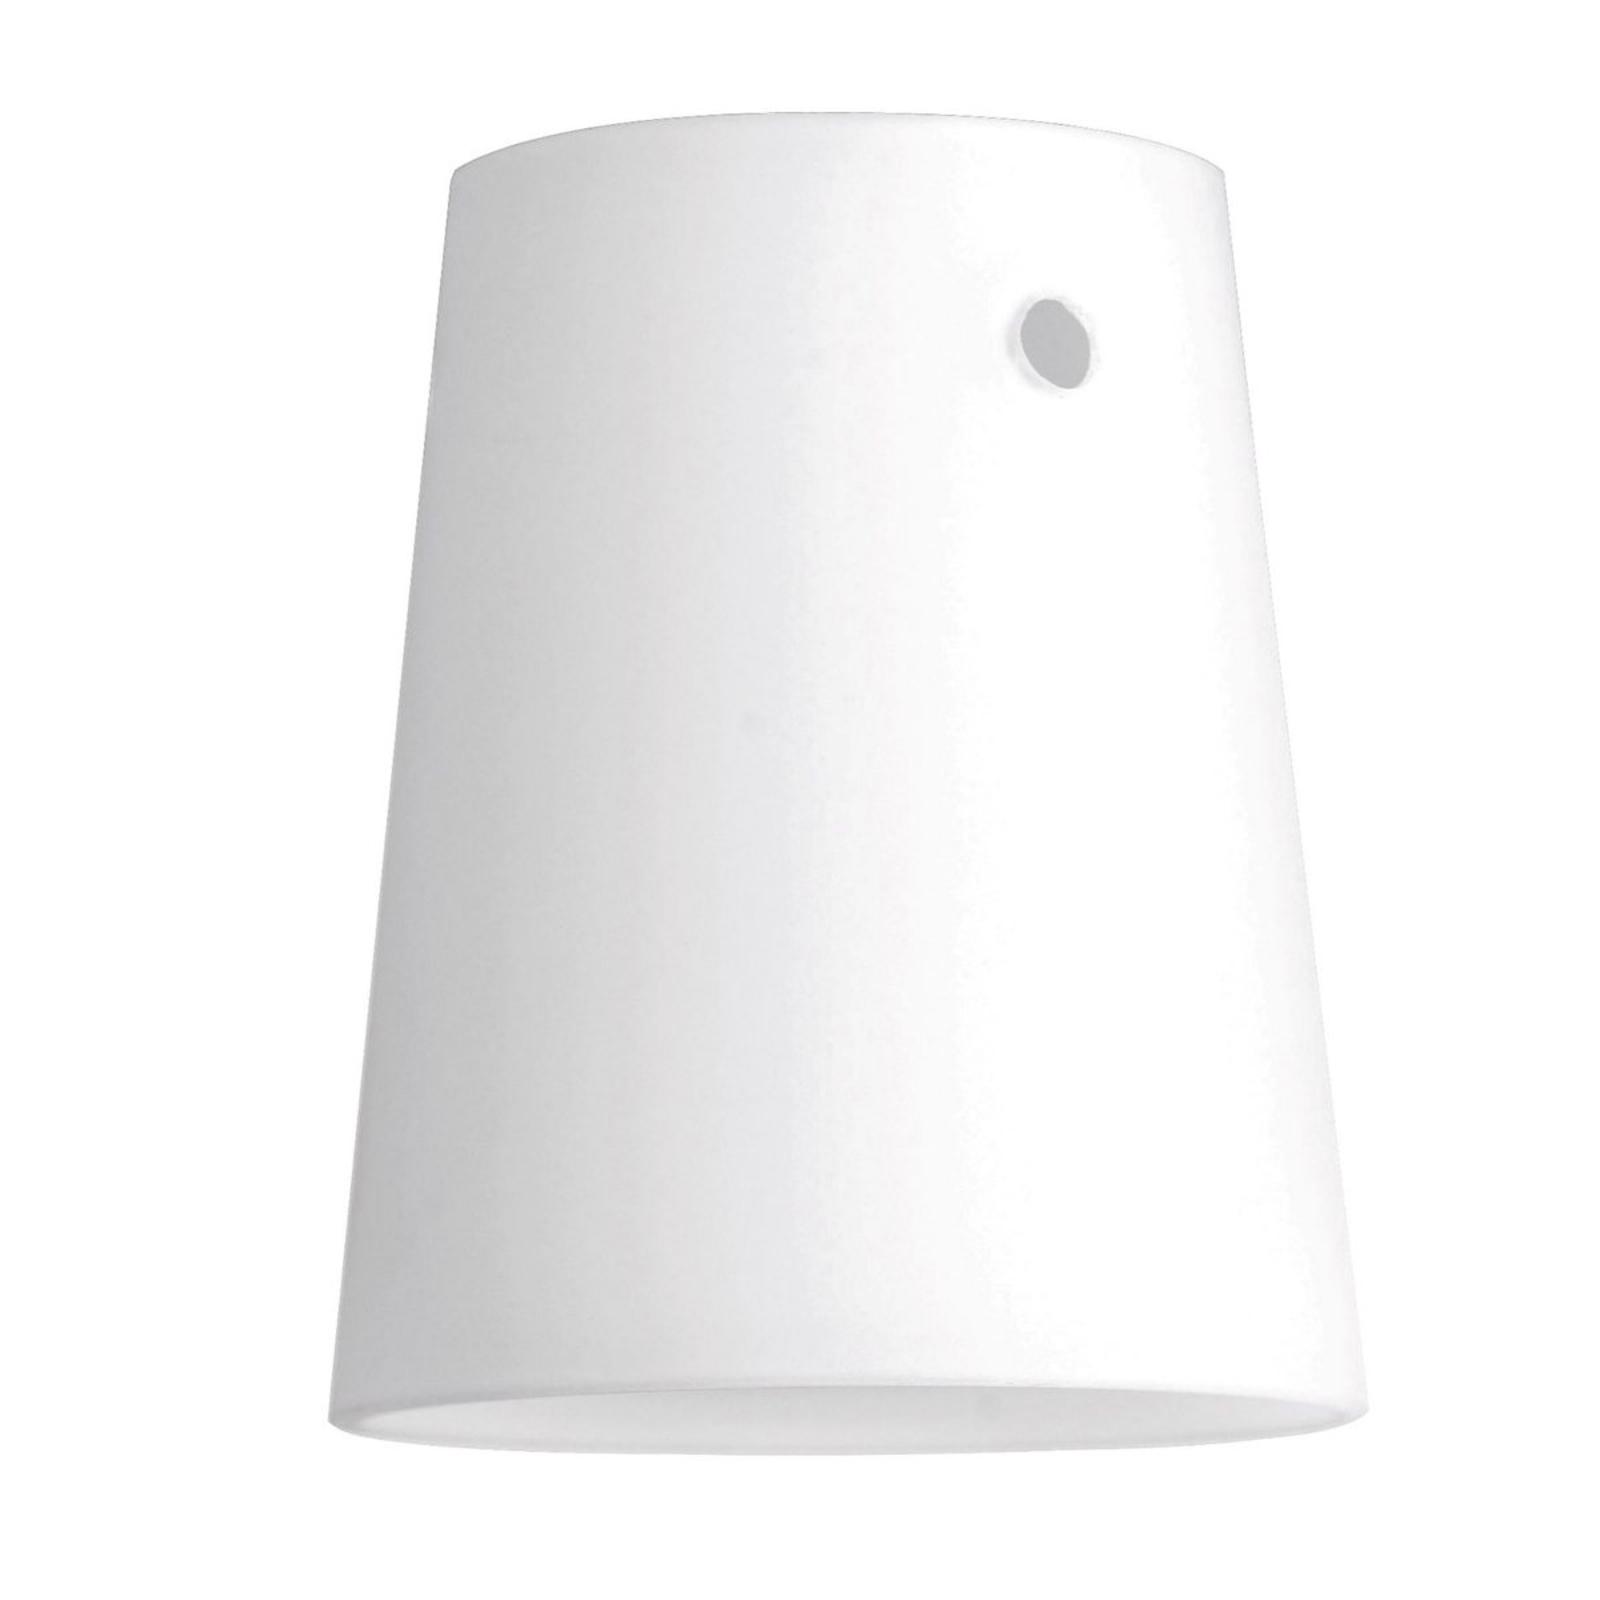 Paralume per spot LED HV-track4, conico 7 cm